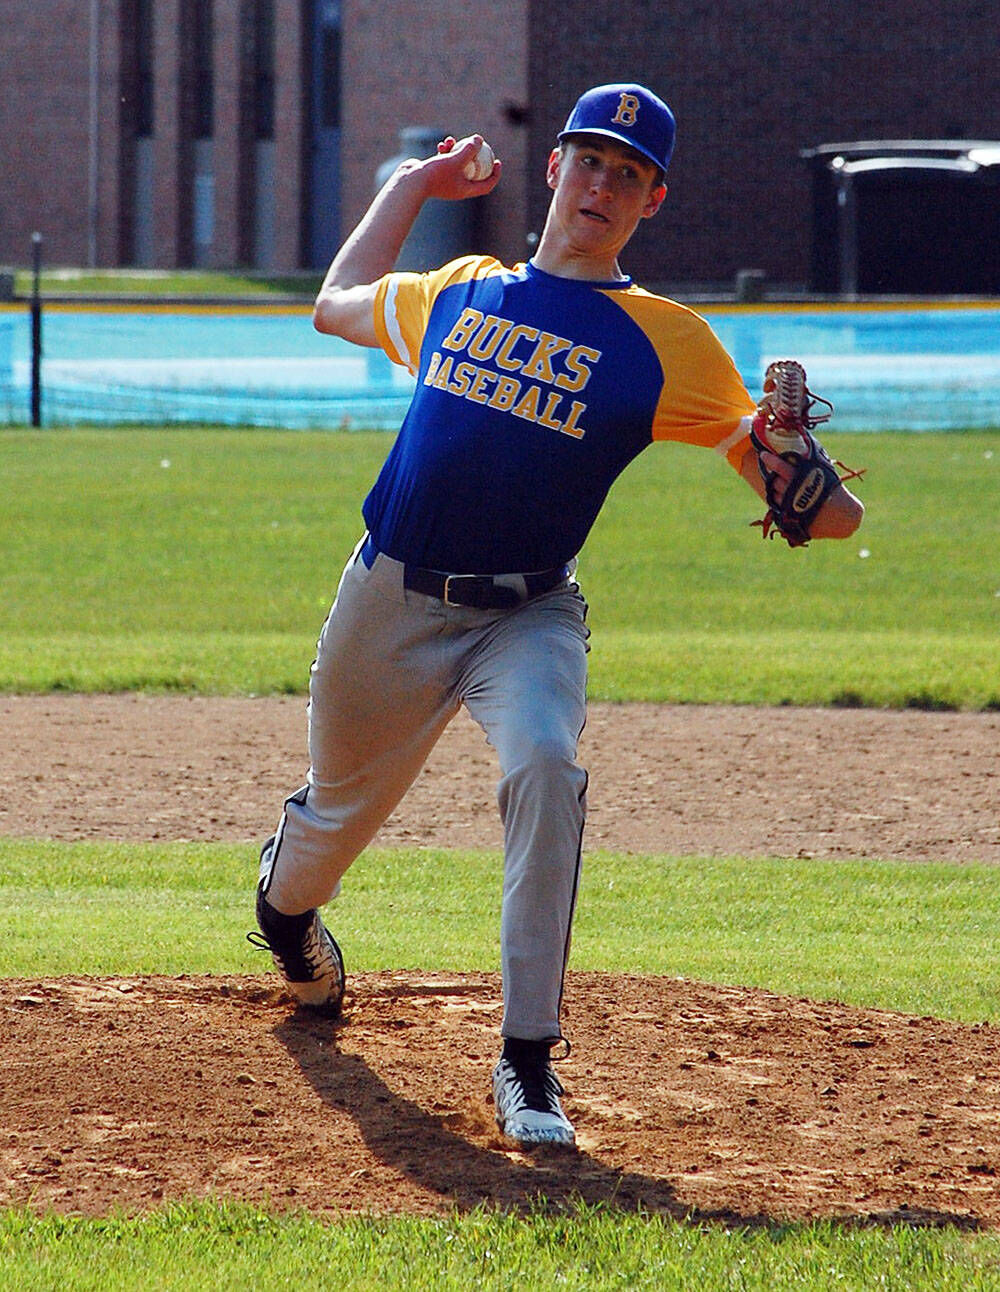 Boys Athlete Of The Week (May 31-June 6): Blue Mountain's Evan Dennis